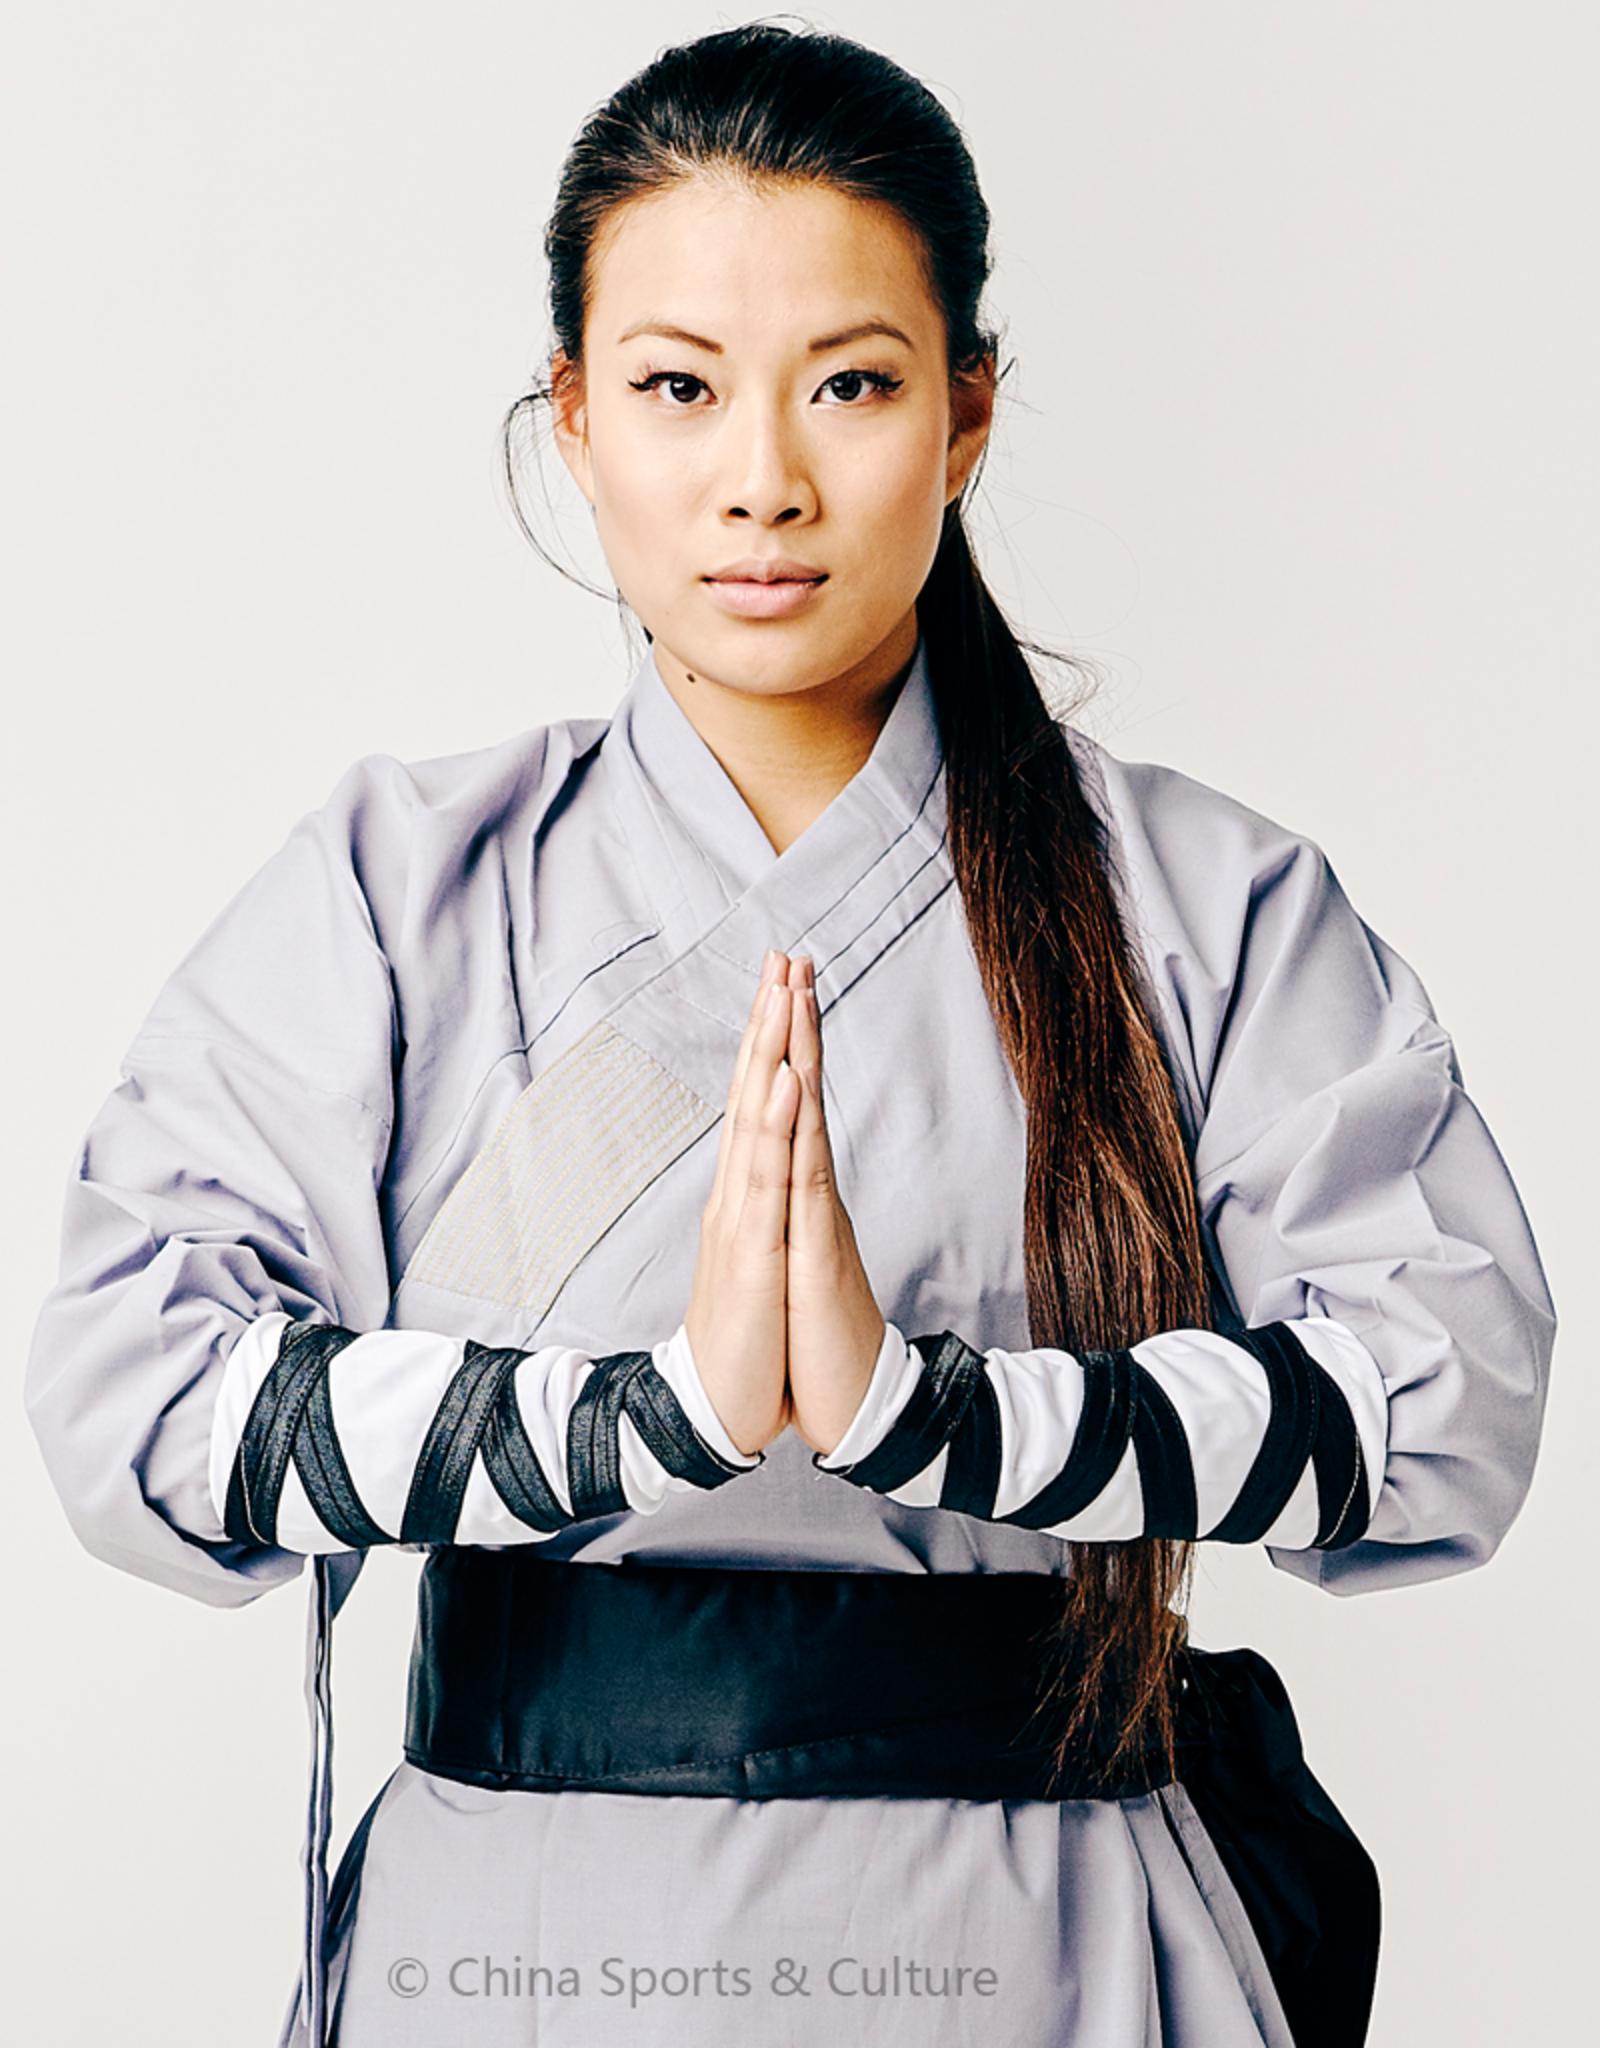 Shaolin Monk Uniform - Grijs